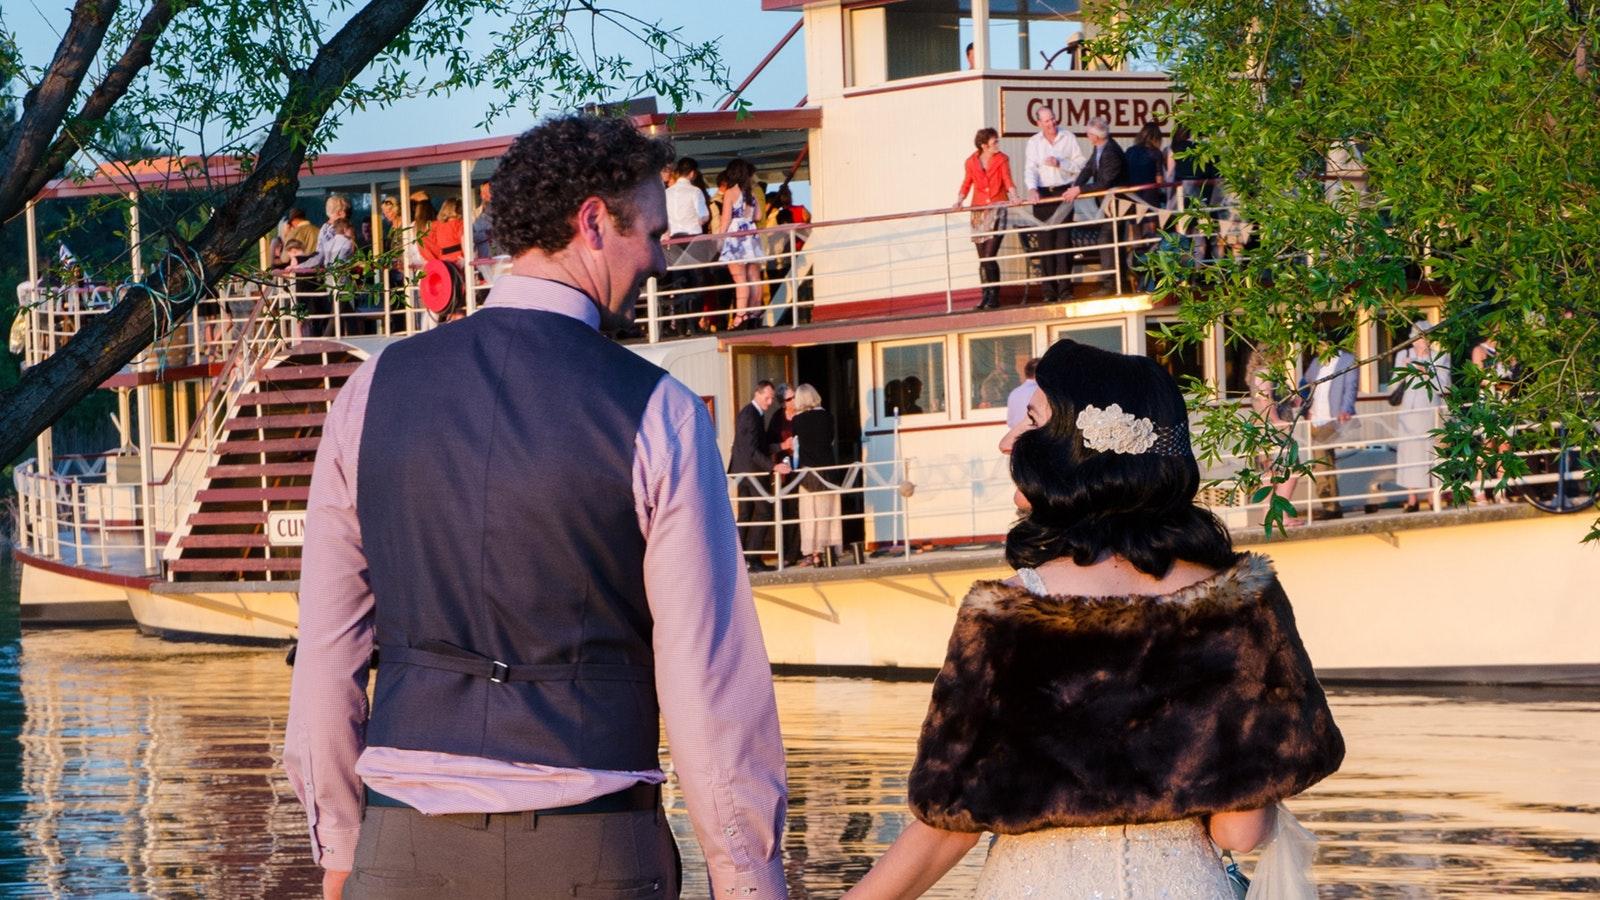 Weddings on the Cumberoona